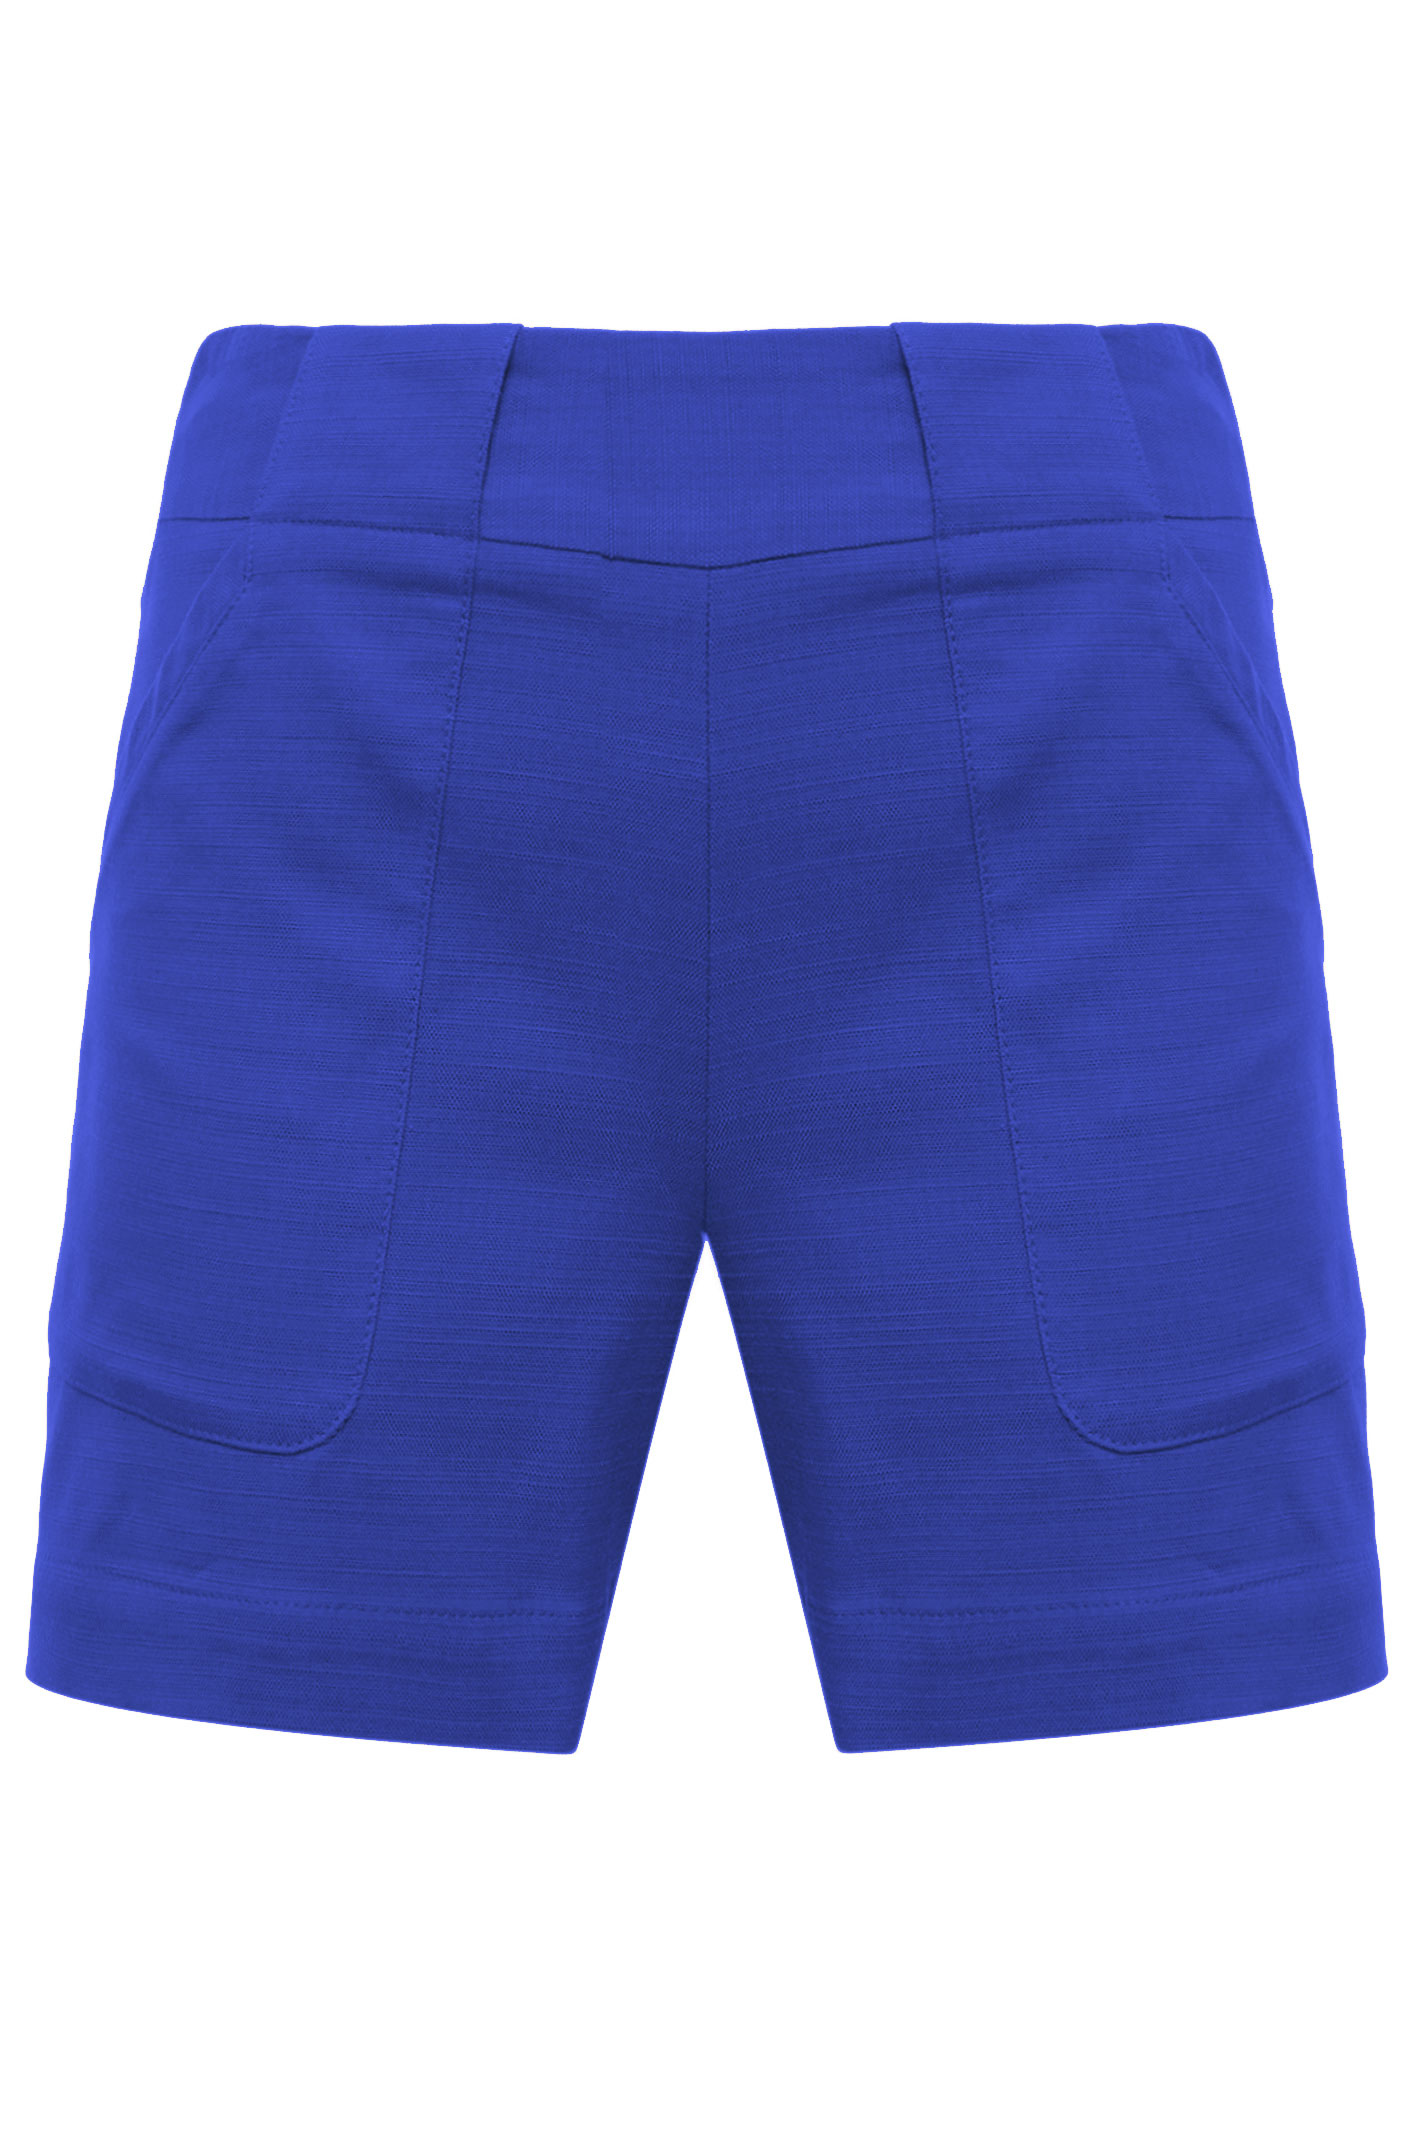 Short Nate Bolso Amplo - Azul